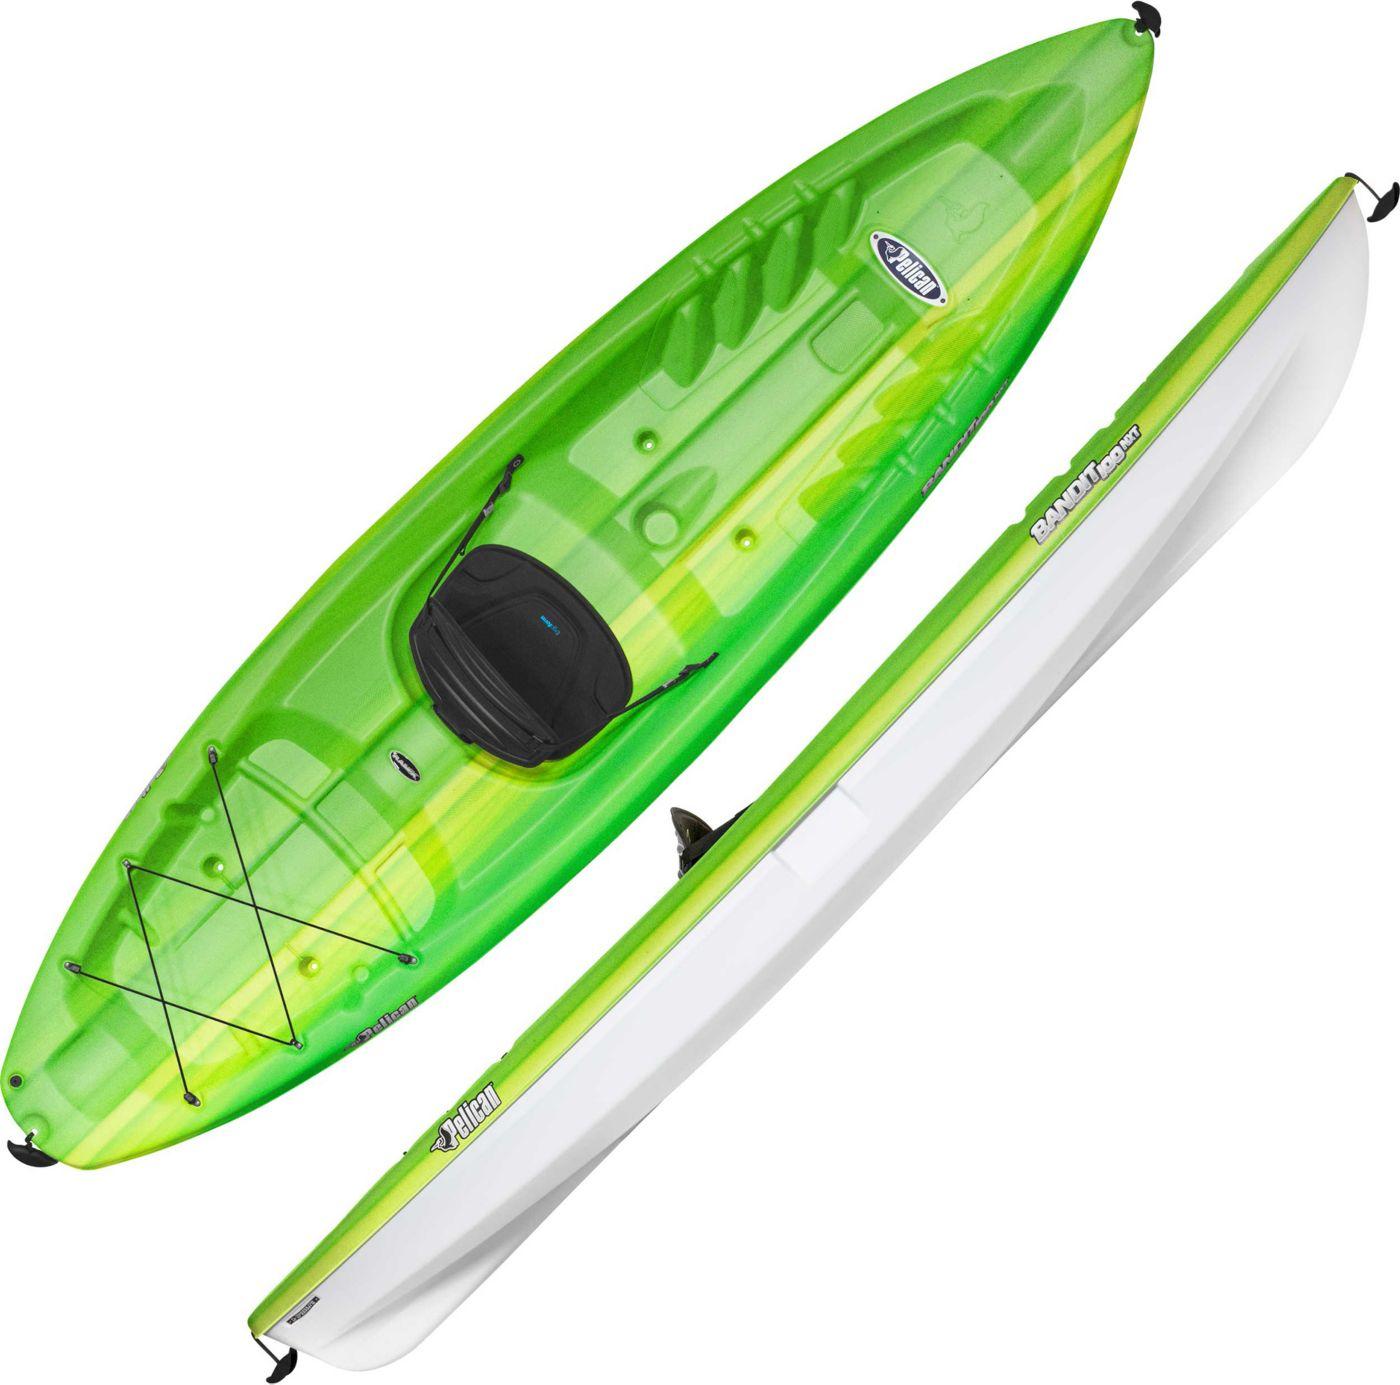 Pelican Bandit NXT 100 Kayak